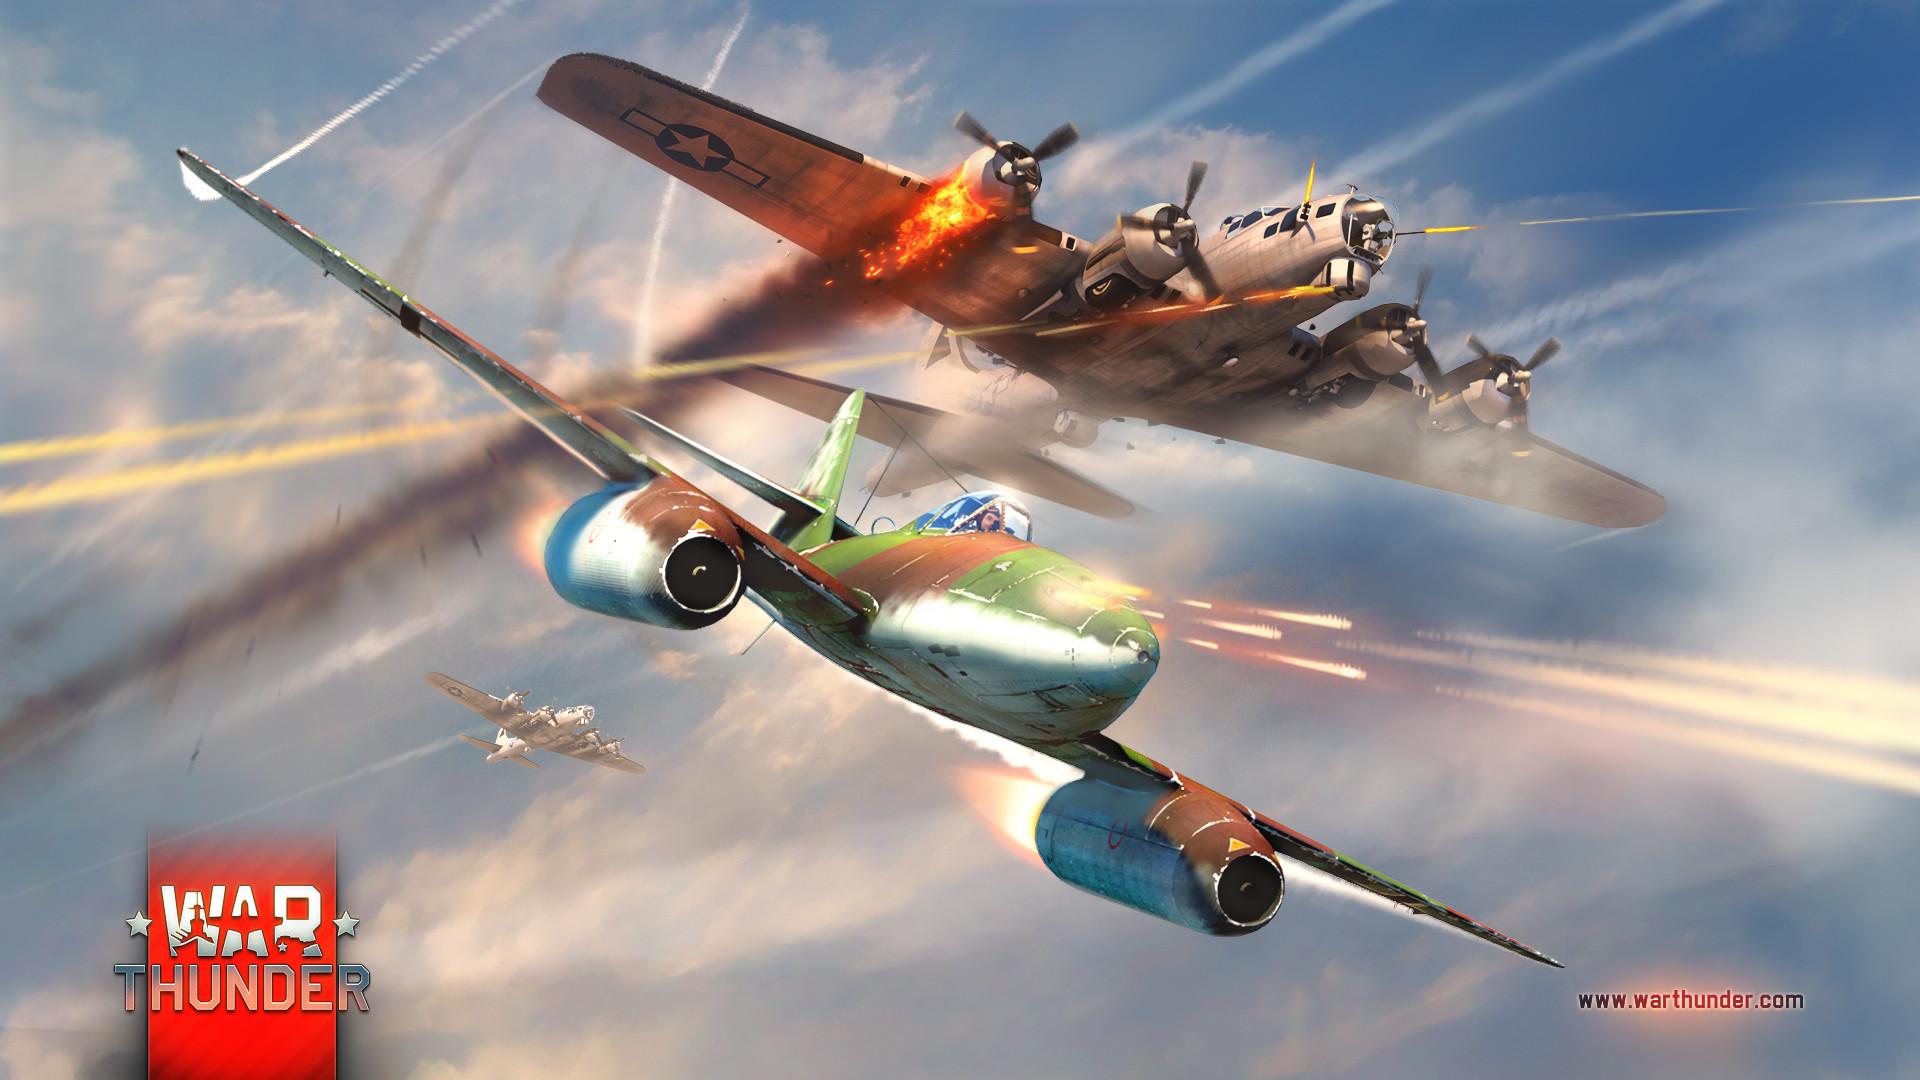 Me262 Versus B17 - Too little too late - News - War Thunder